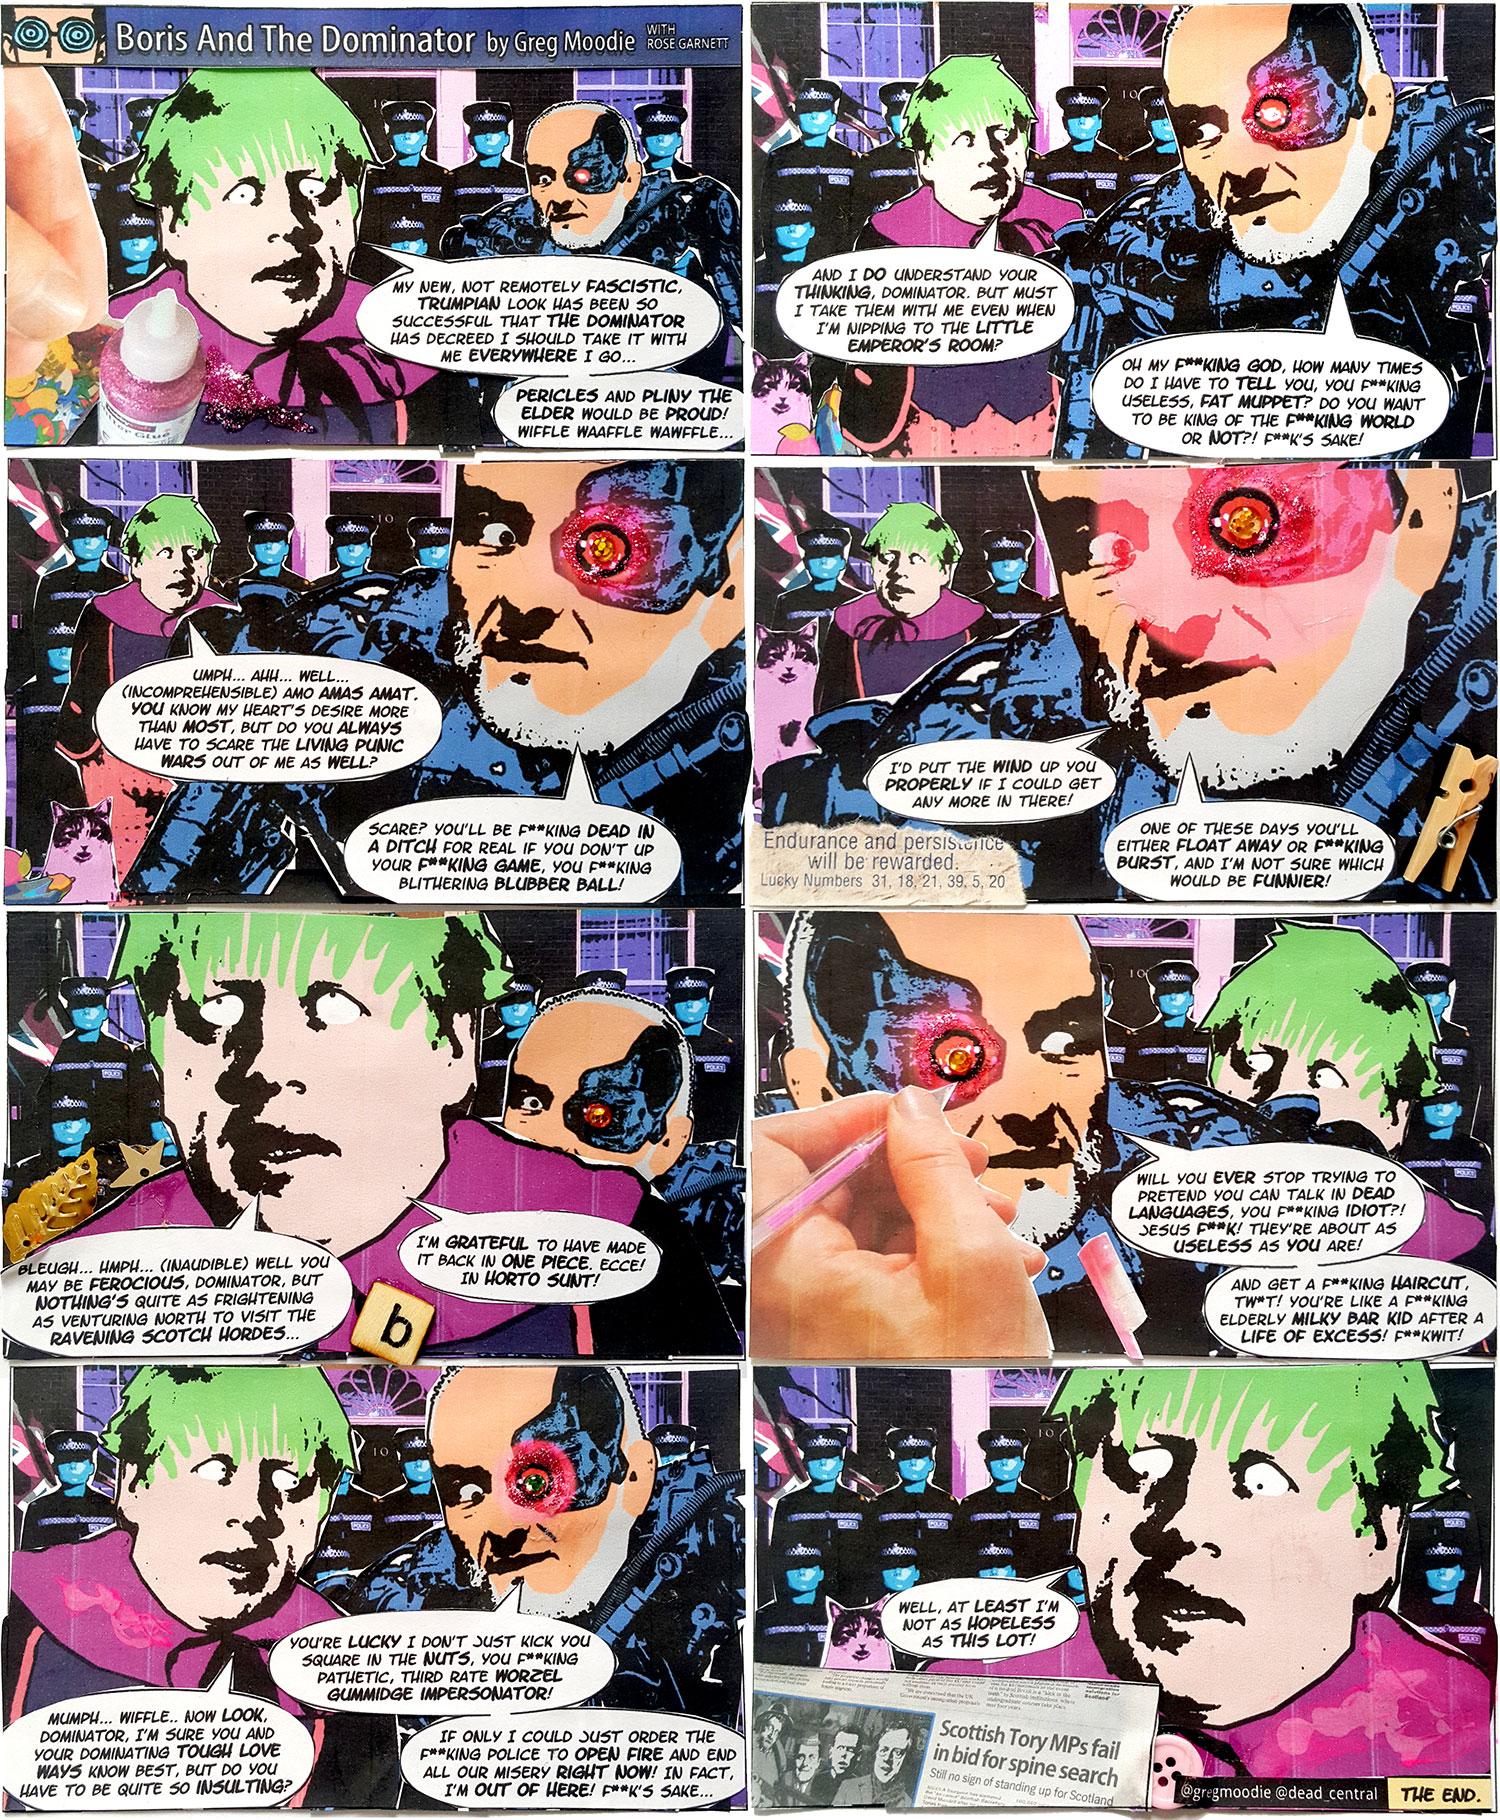 Boris And The Dominator